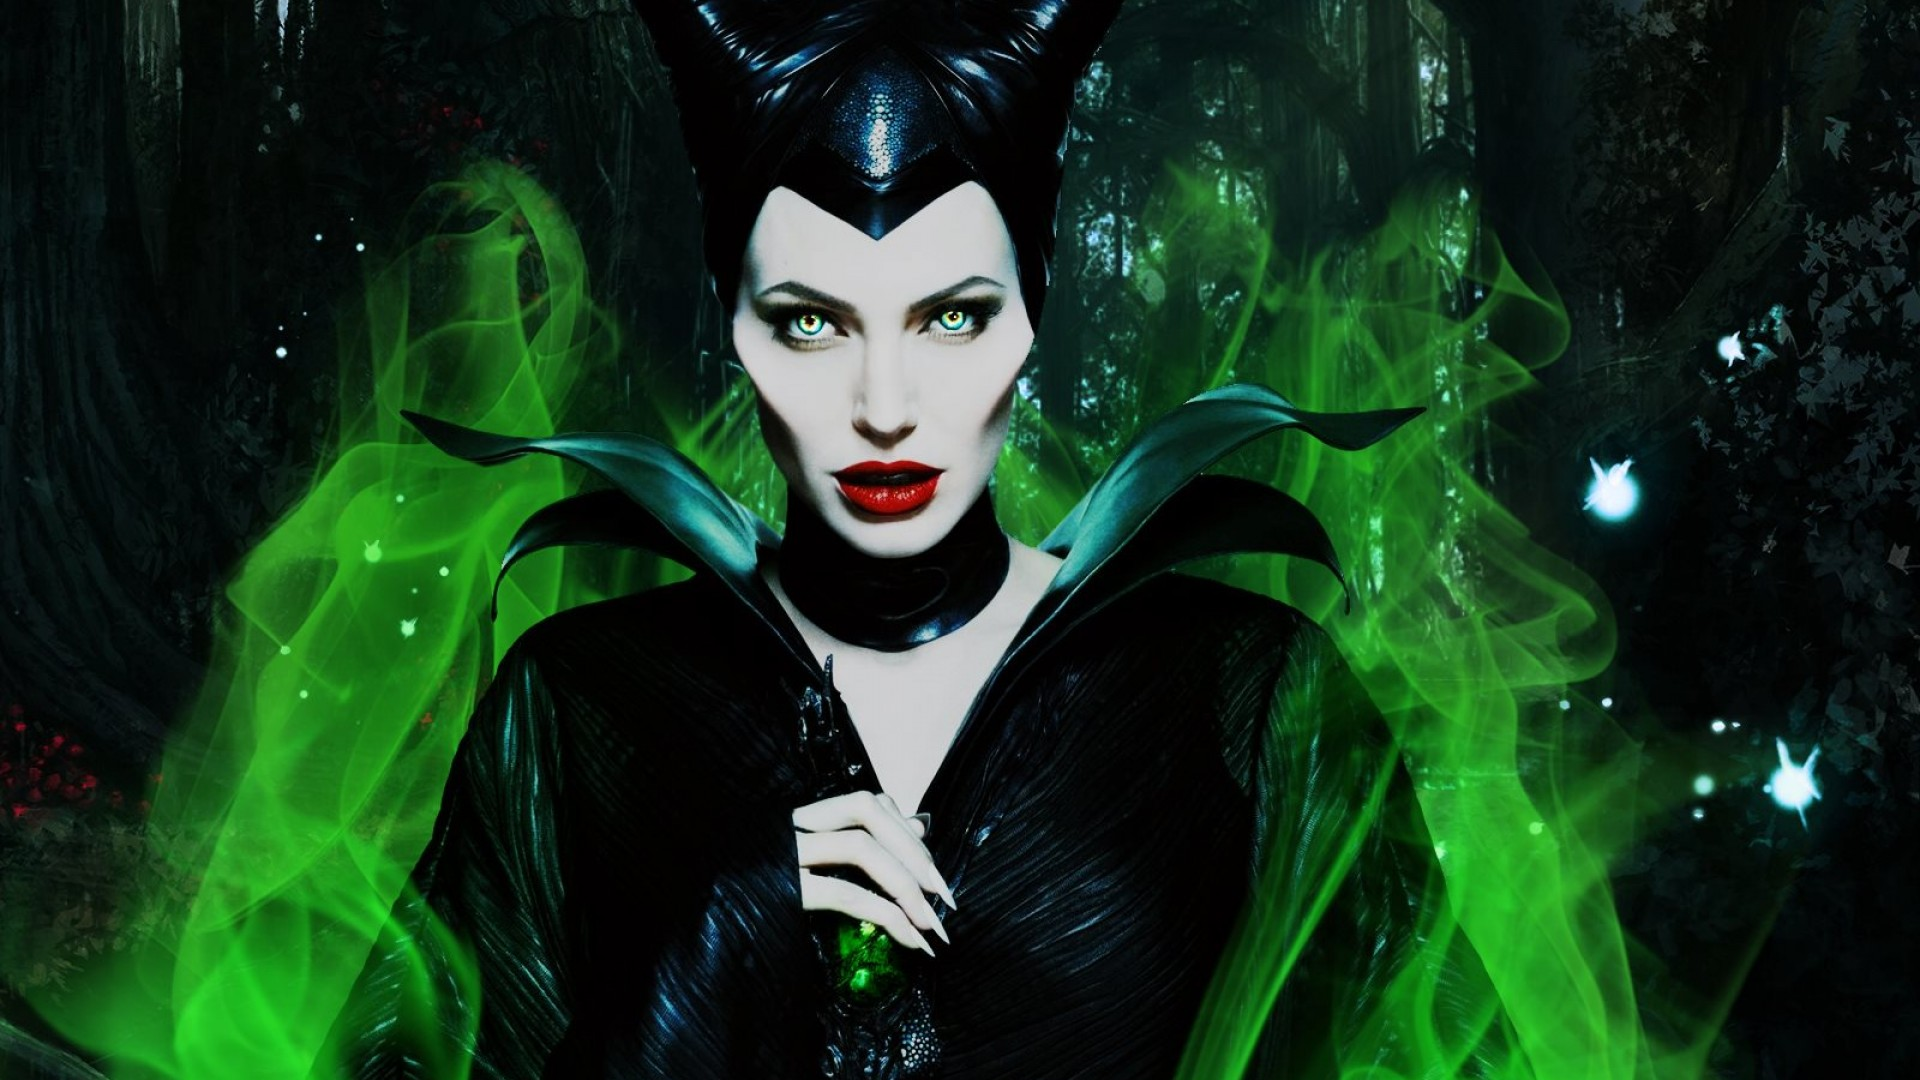 Maleficent wallpaper 4